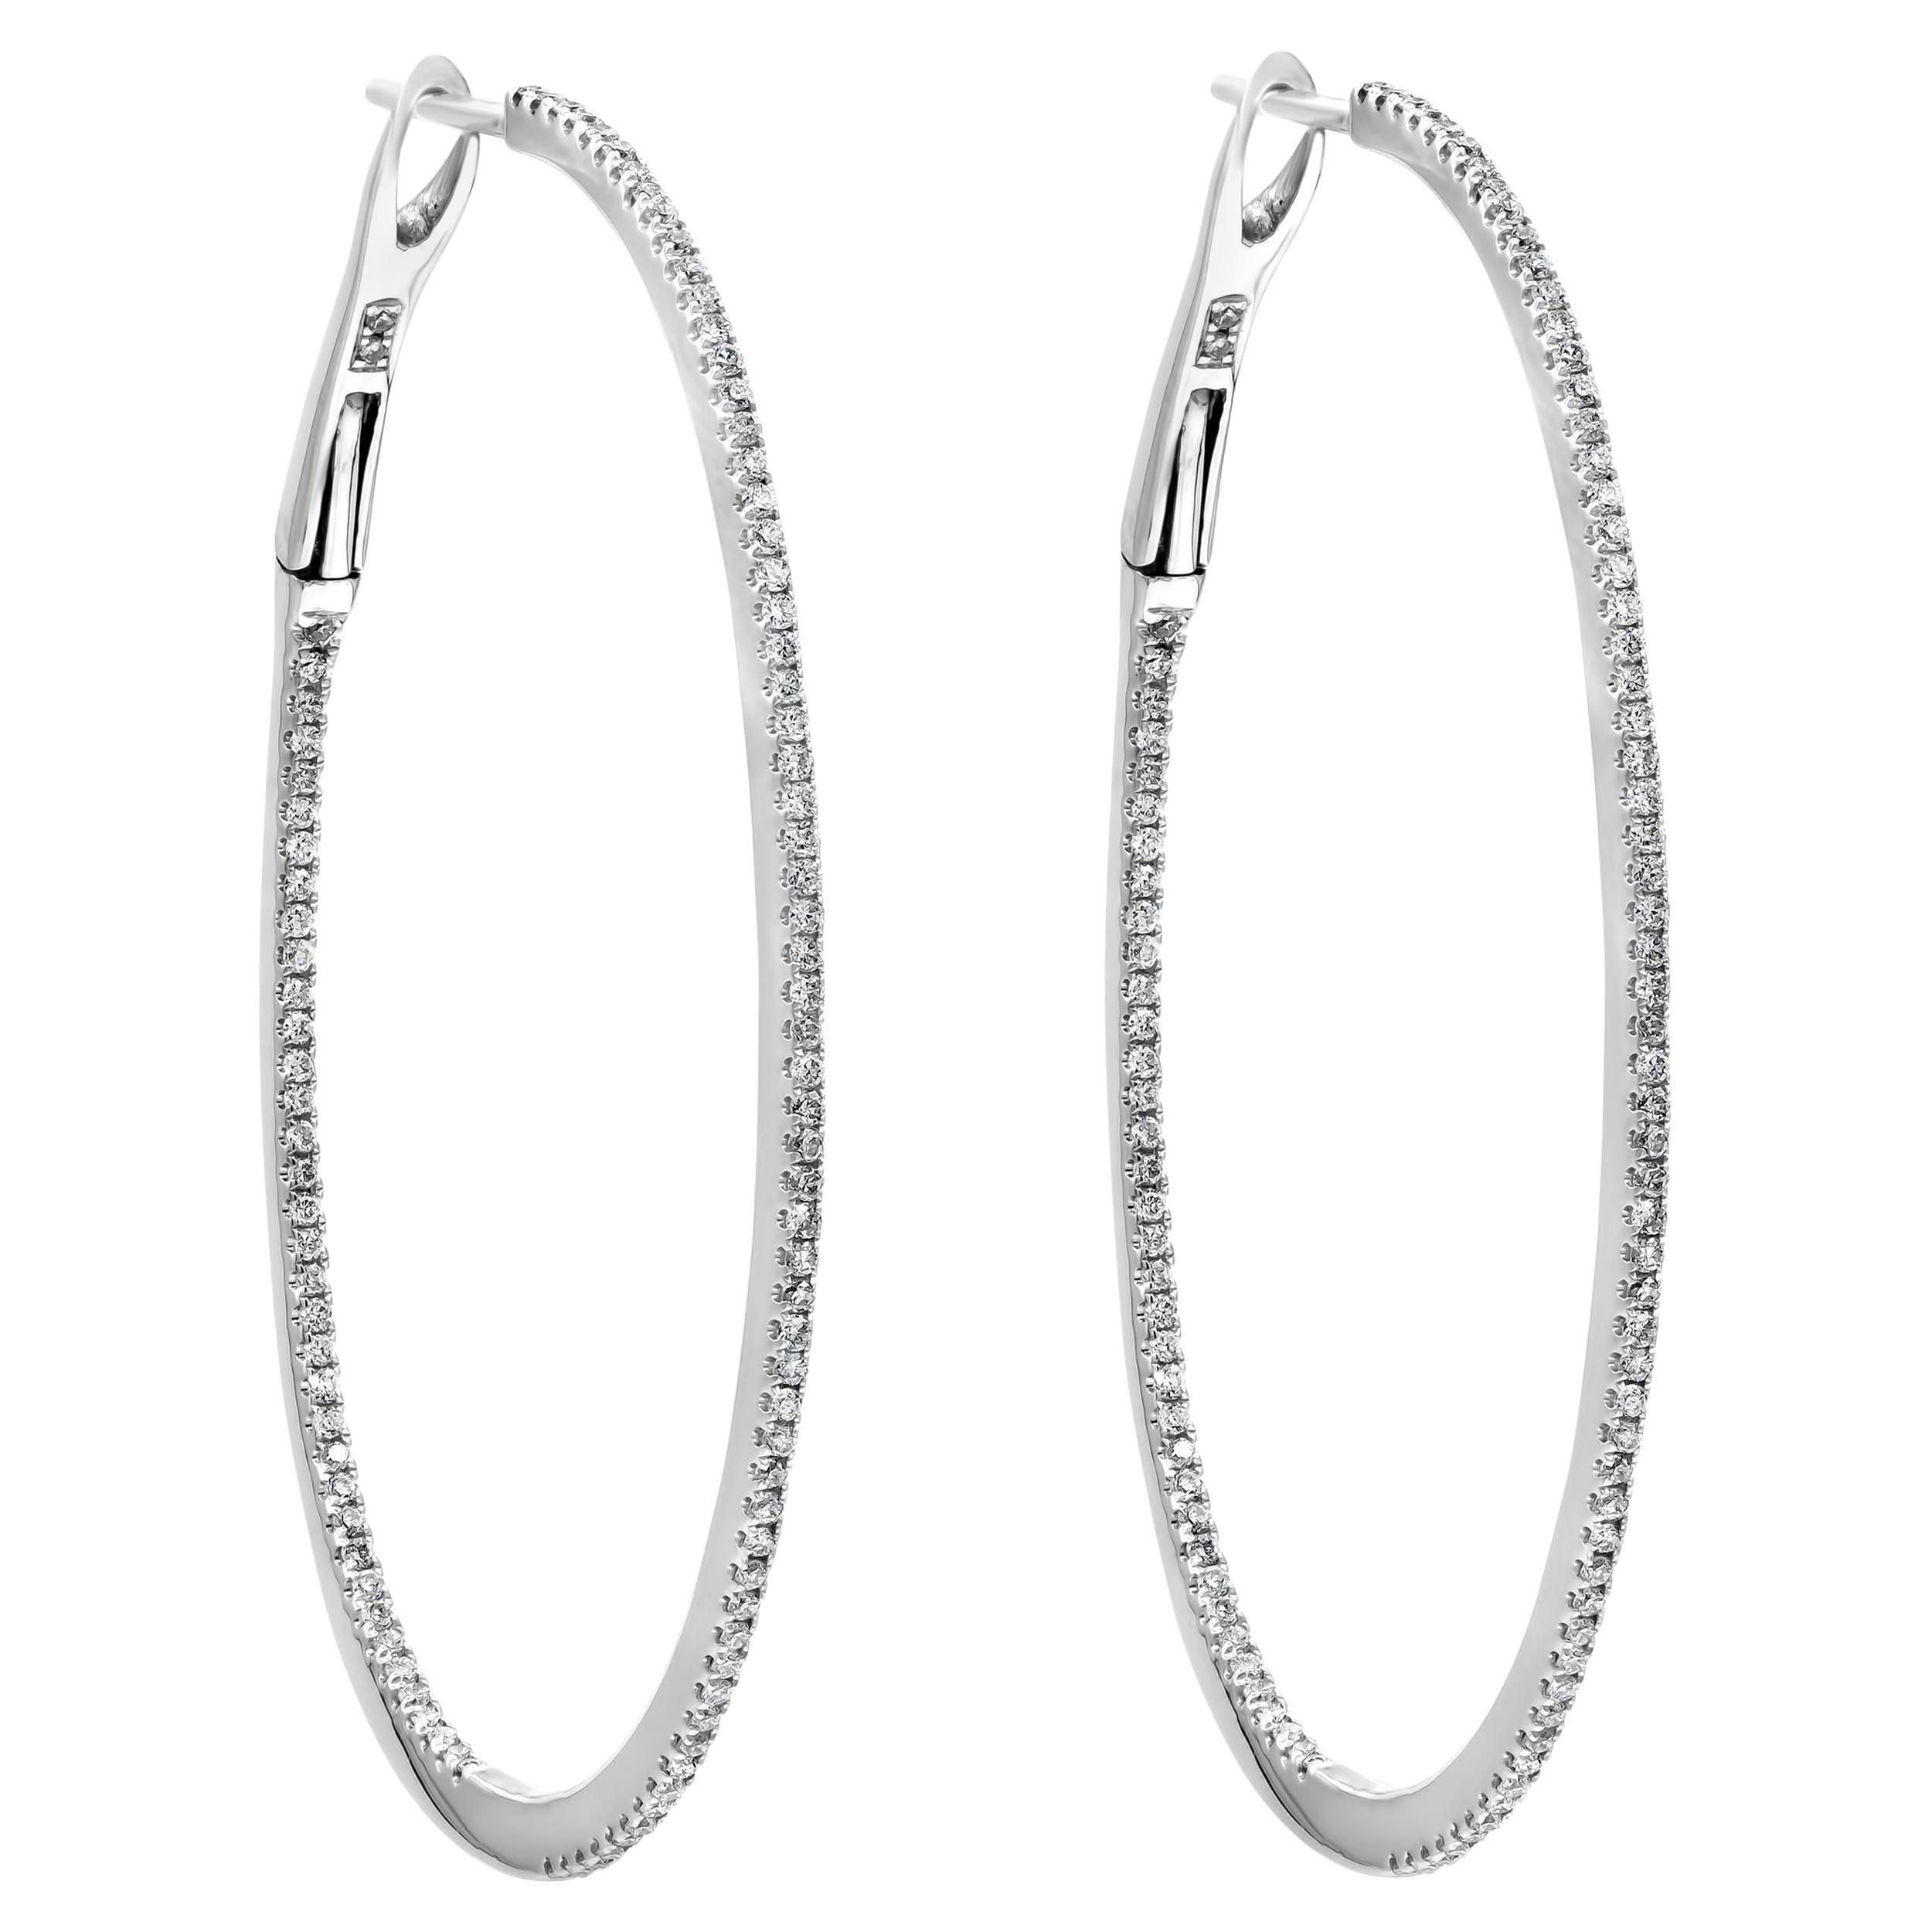 Round Diamond Hoop Earrings in 18 Karat White Gold